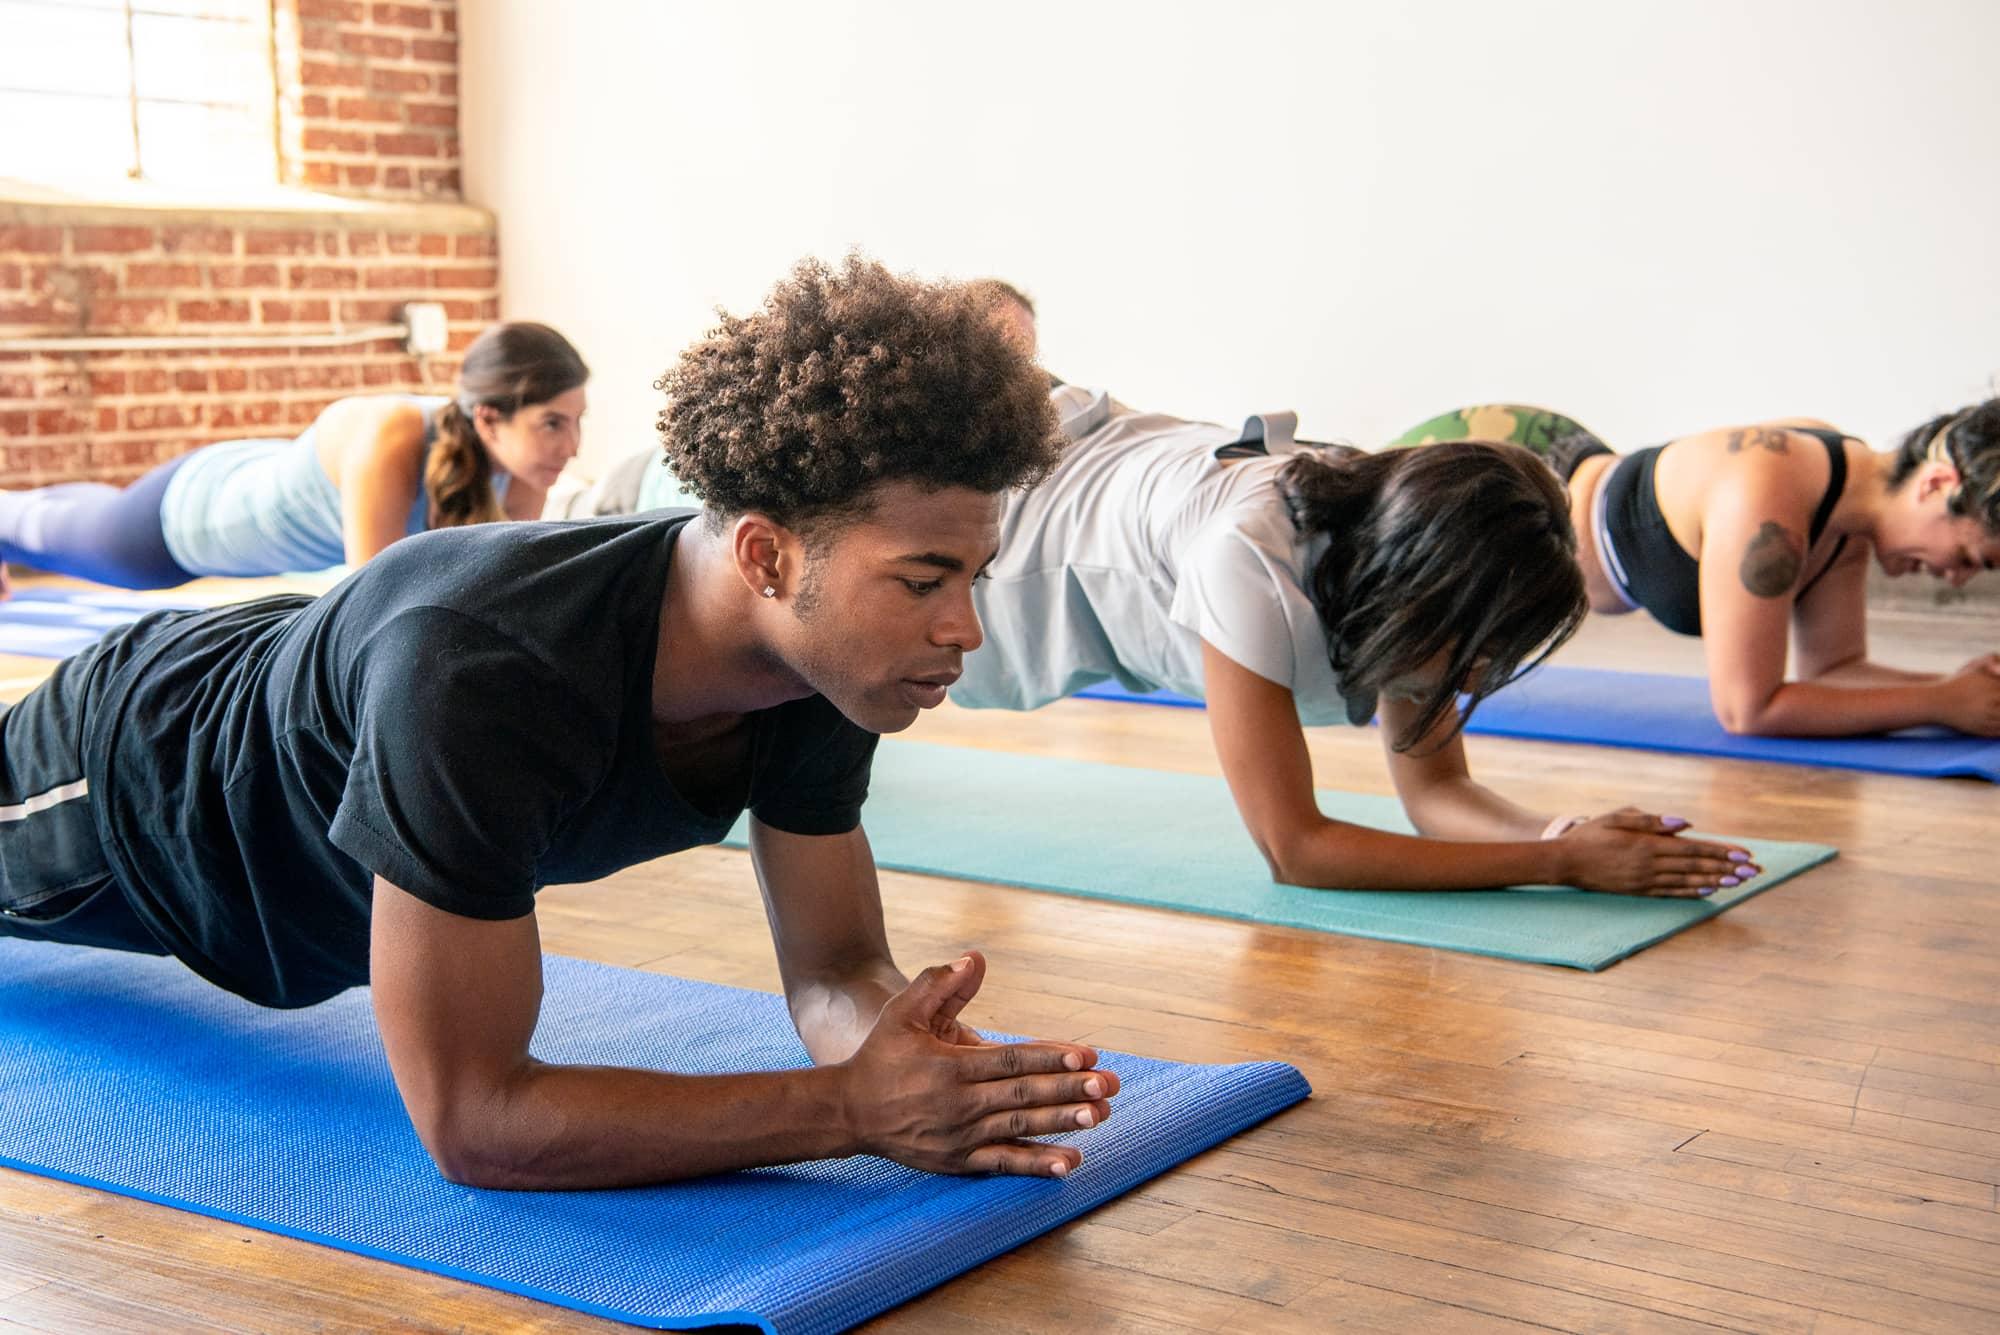 Yoga Class Plank